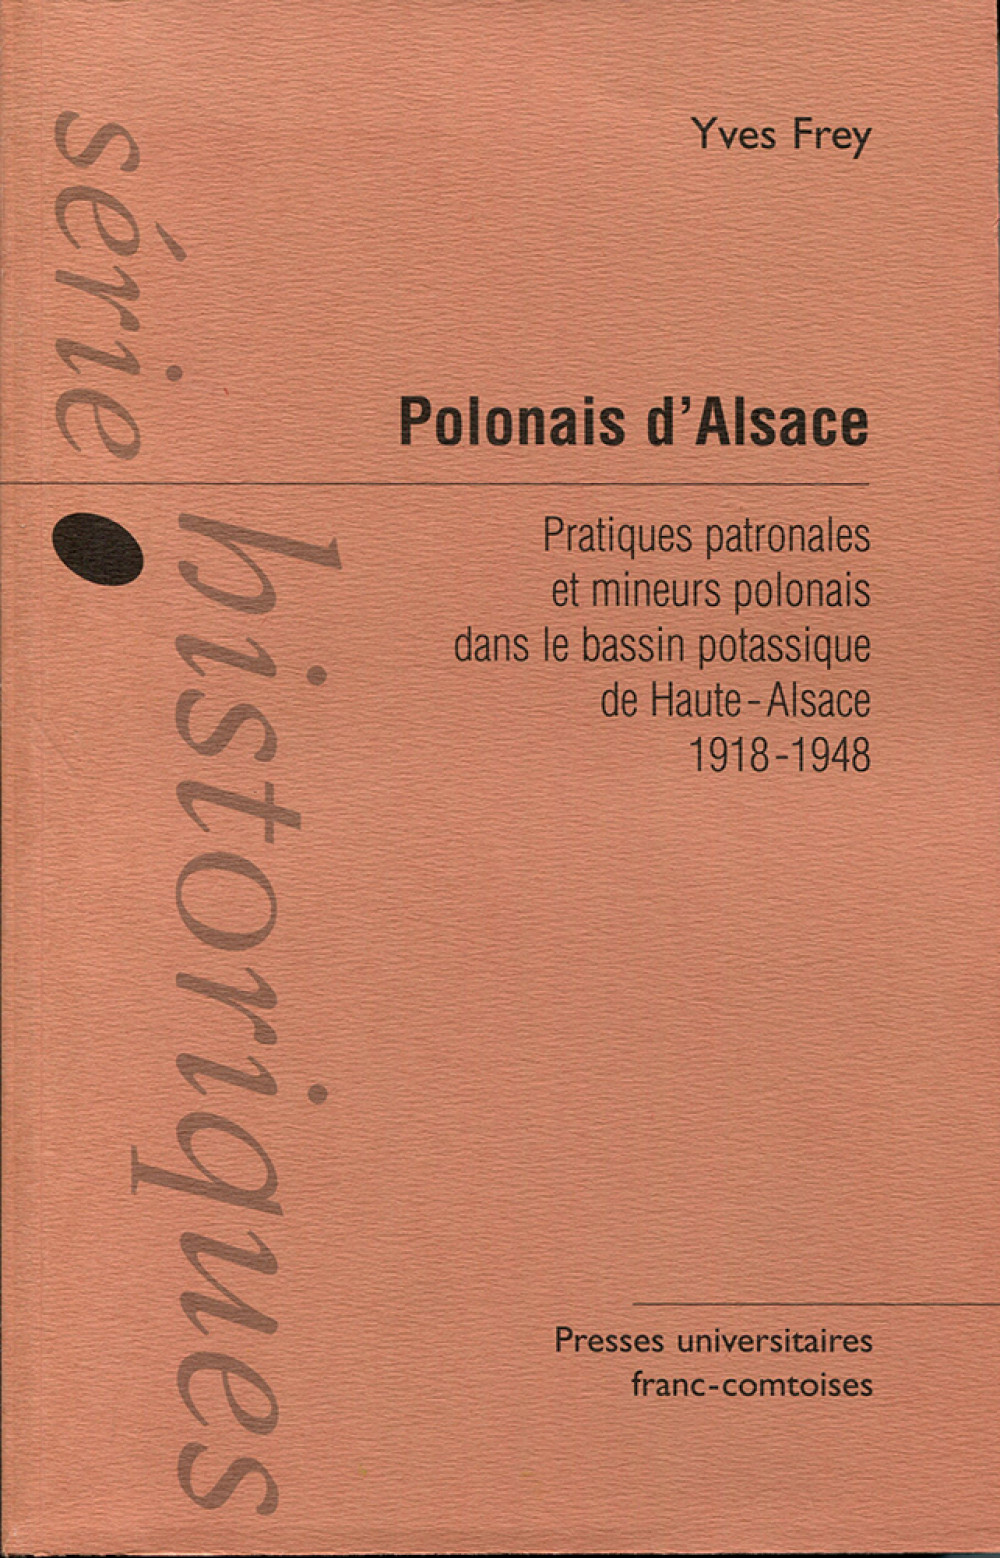 Polonais d'Alsace